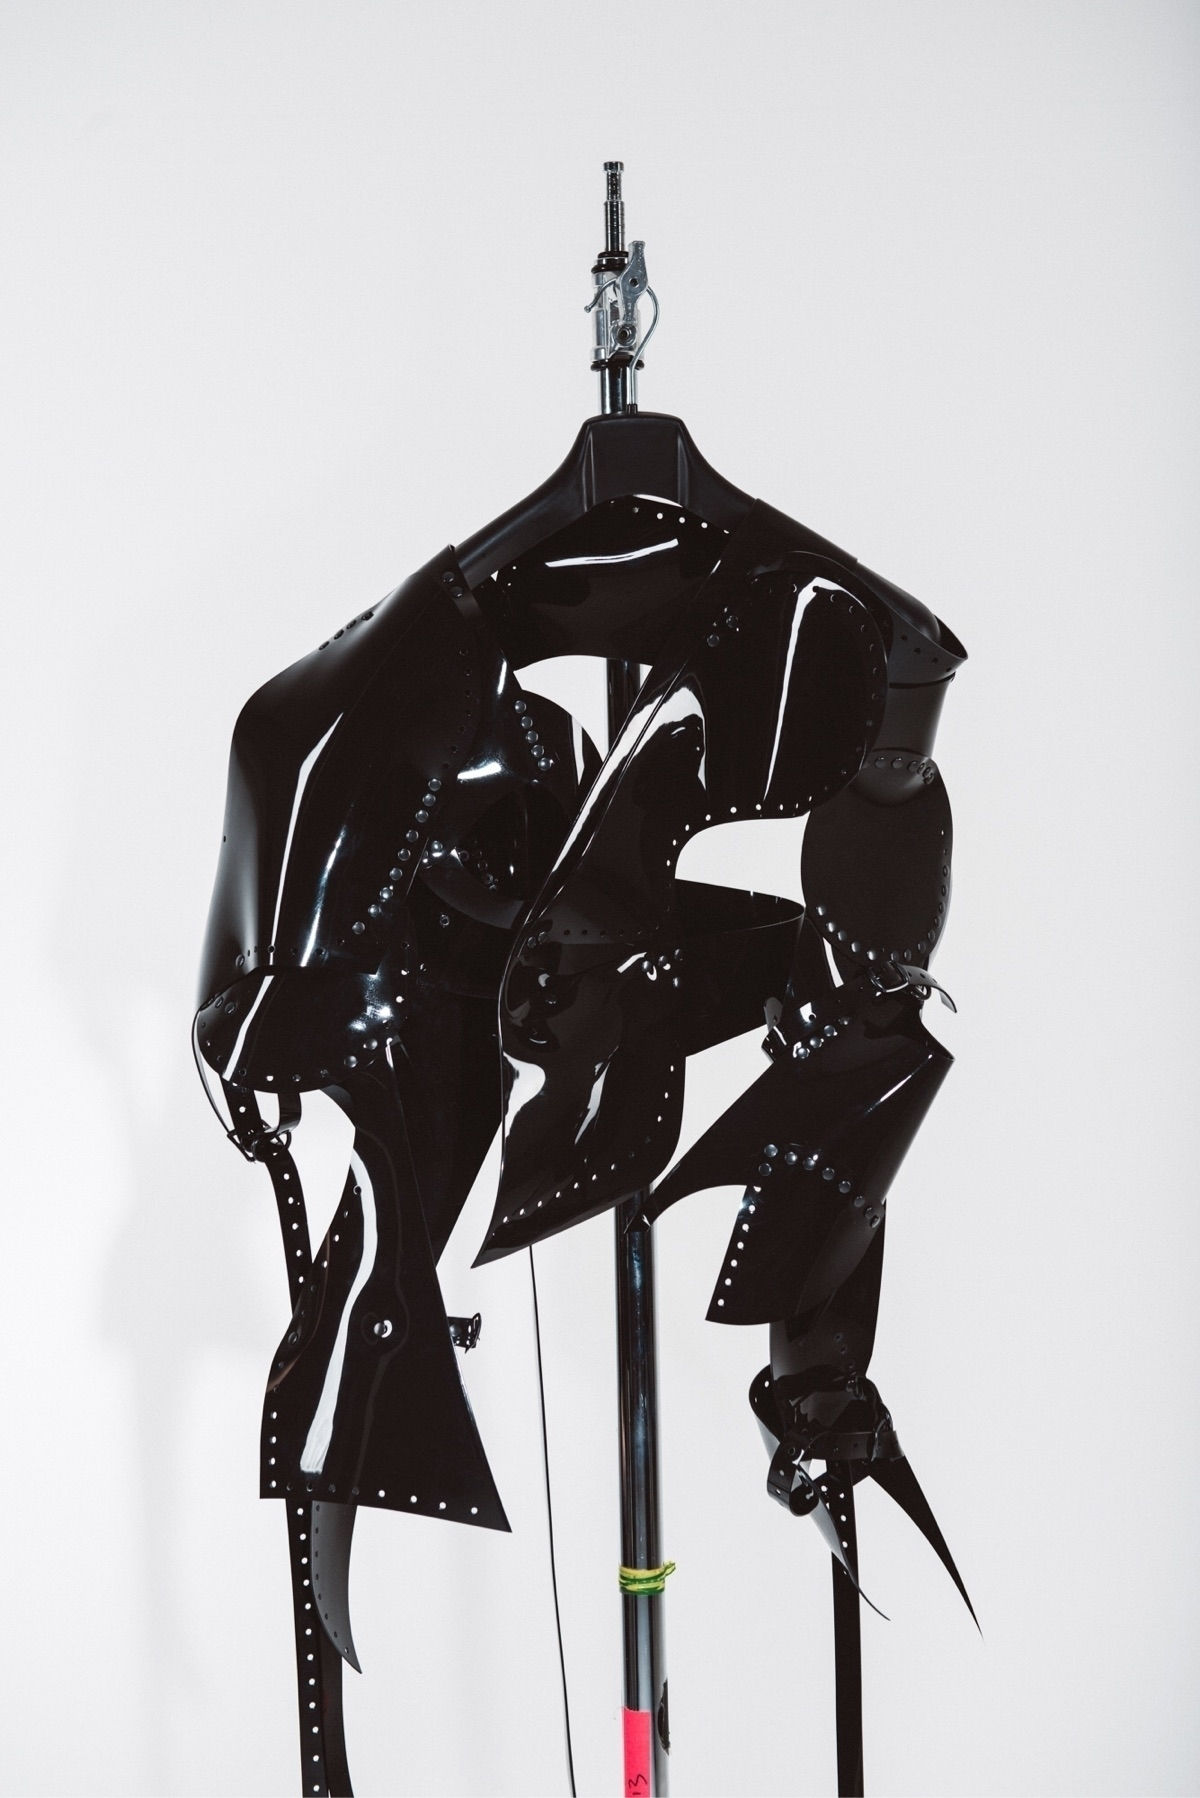 aw17, black, jacket, ShadowsOfMyFuture - jivomir_domoustchiev | ello